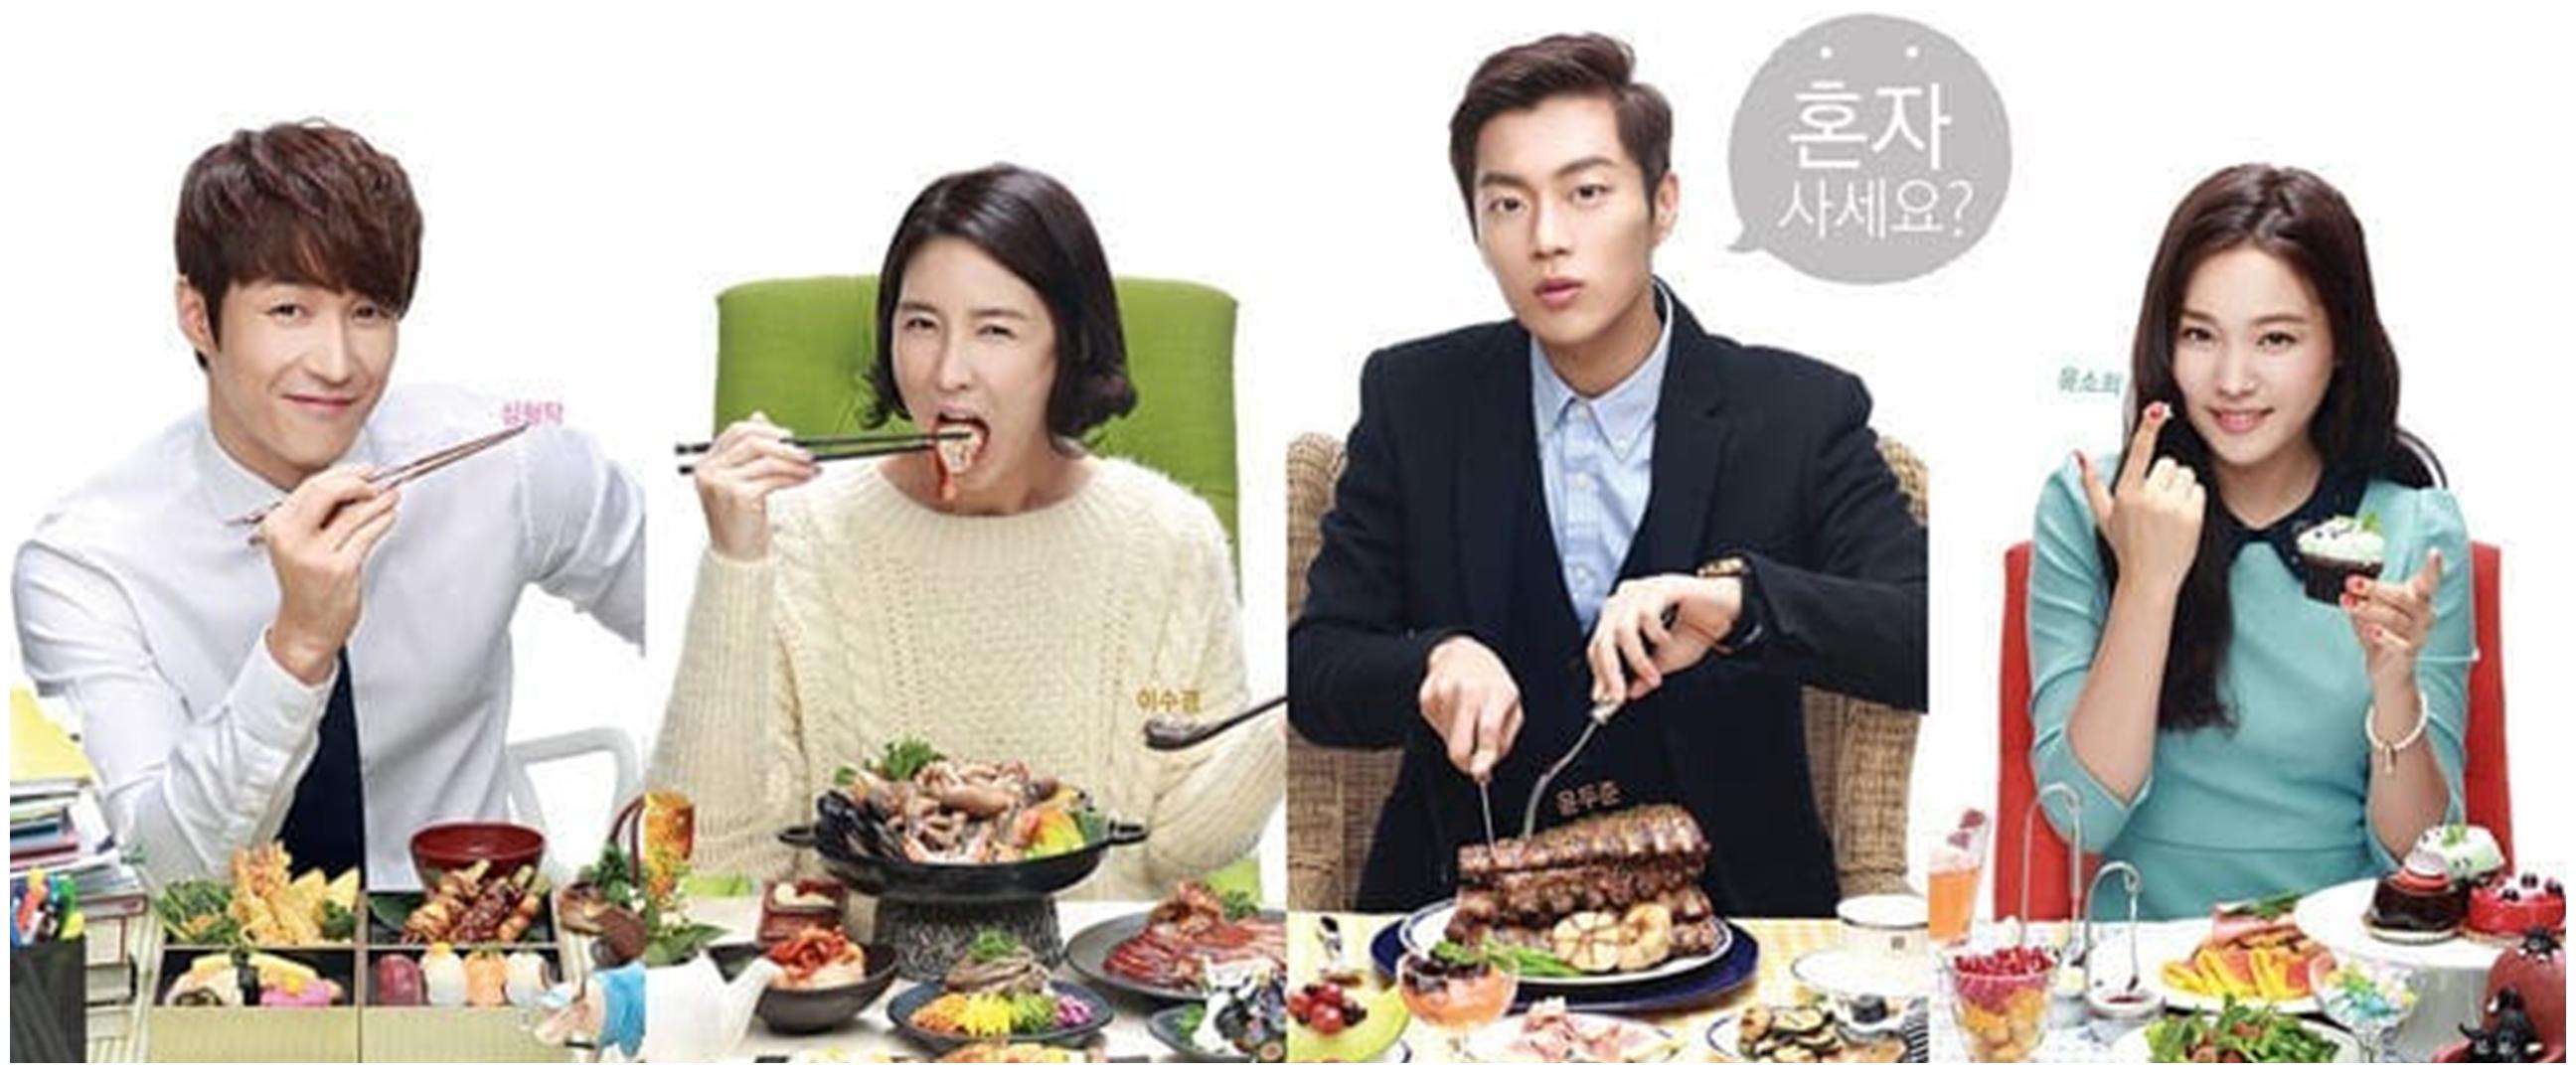 11 Drama Korea bertema kuliner, seru & bikin ngiler seketika